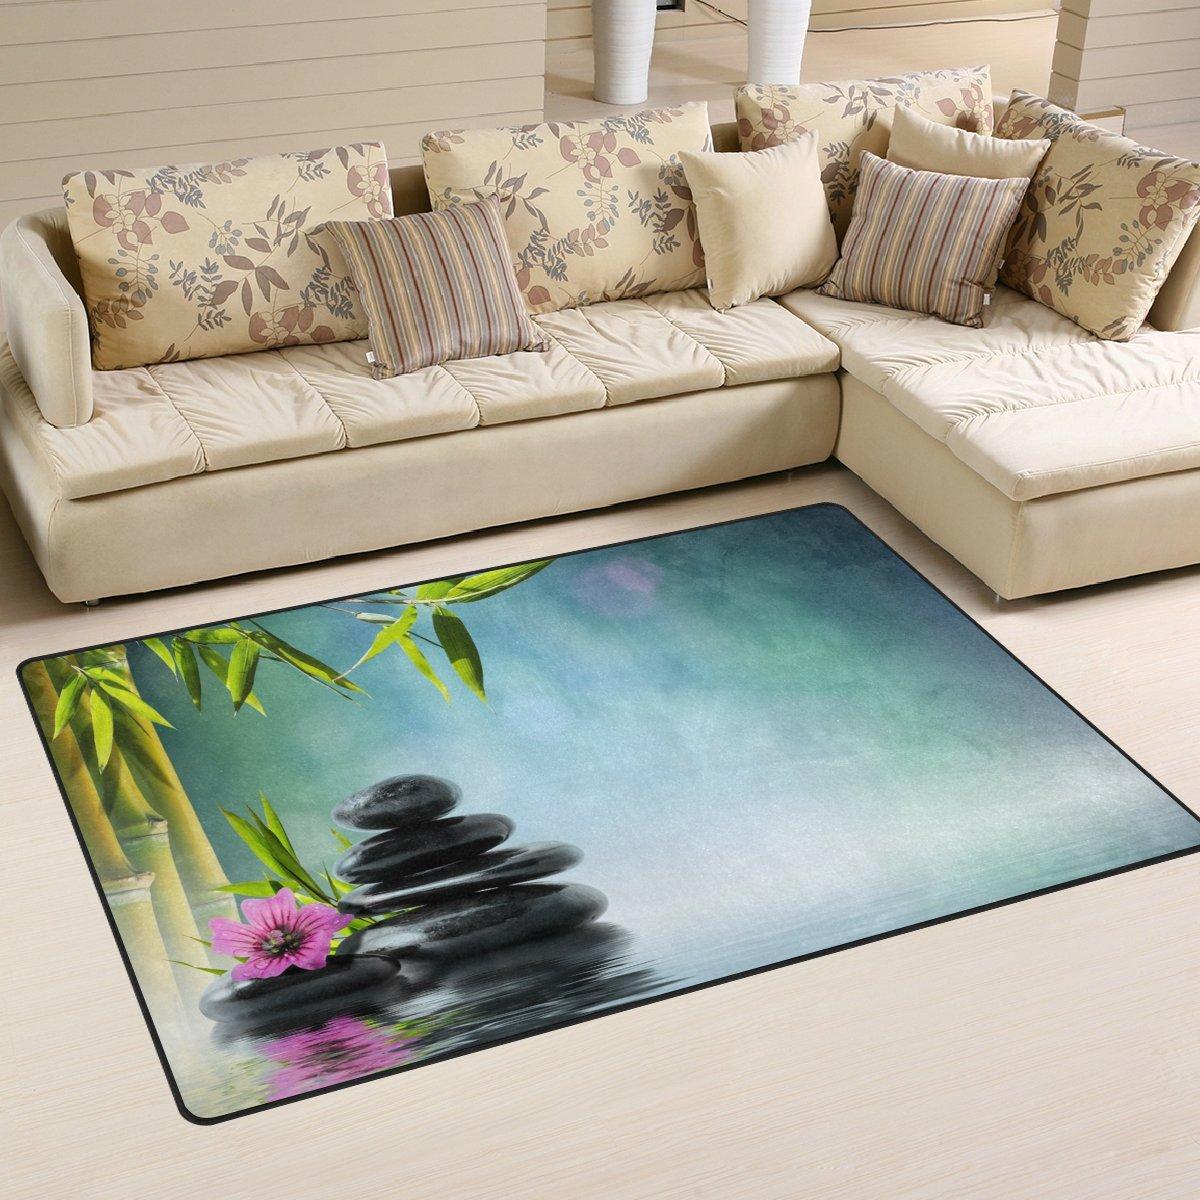 WellLee Area Rug,Tower Black Stone Hibiscus Bamboo Floor Rug Non-slip Doormat for Living Dining Dorm Room Bedroom Decor 60x39 Inch